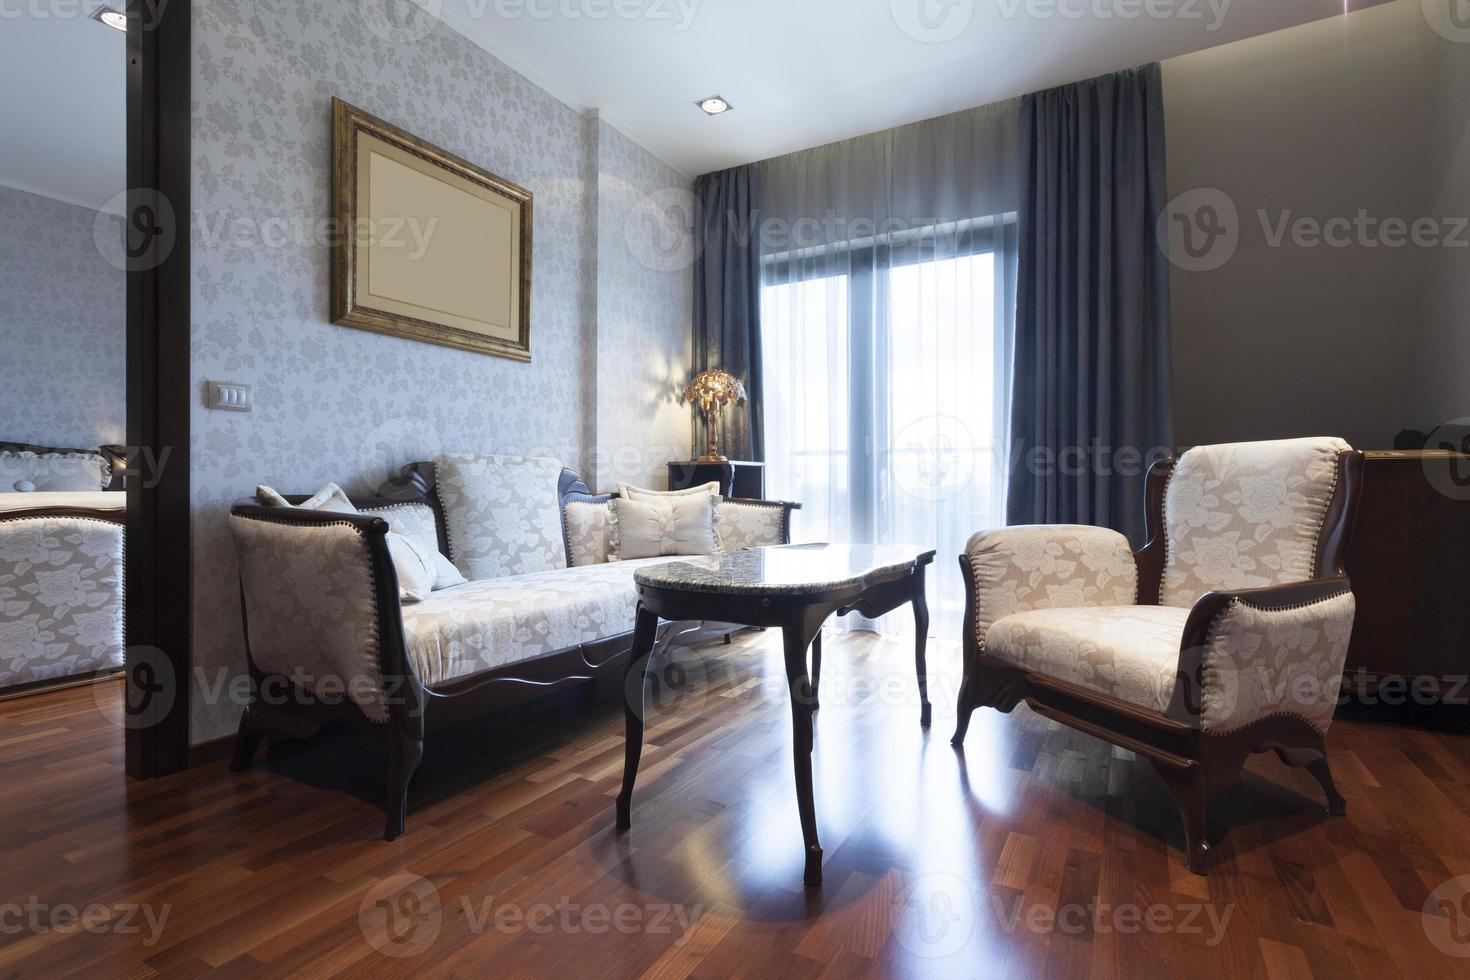 suite hotel com mobília de estilo clássico foto